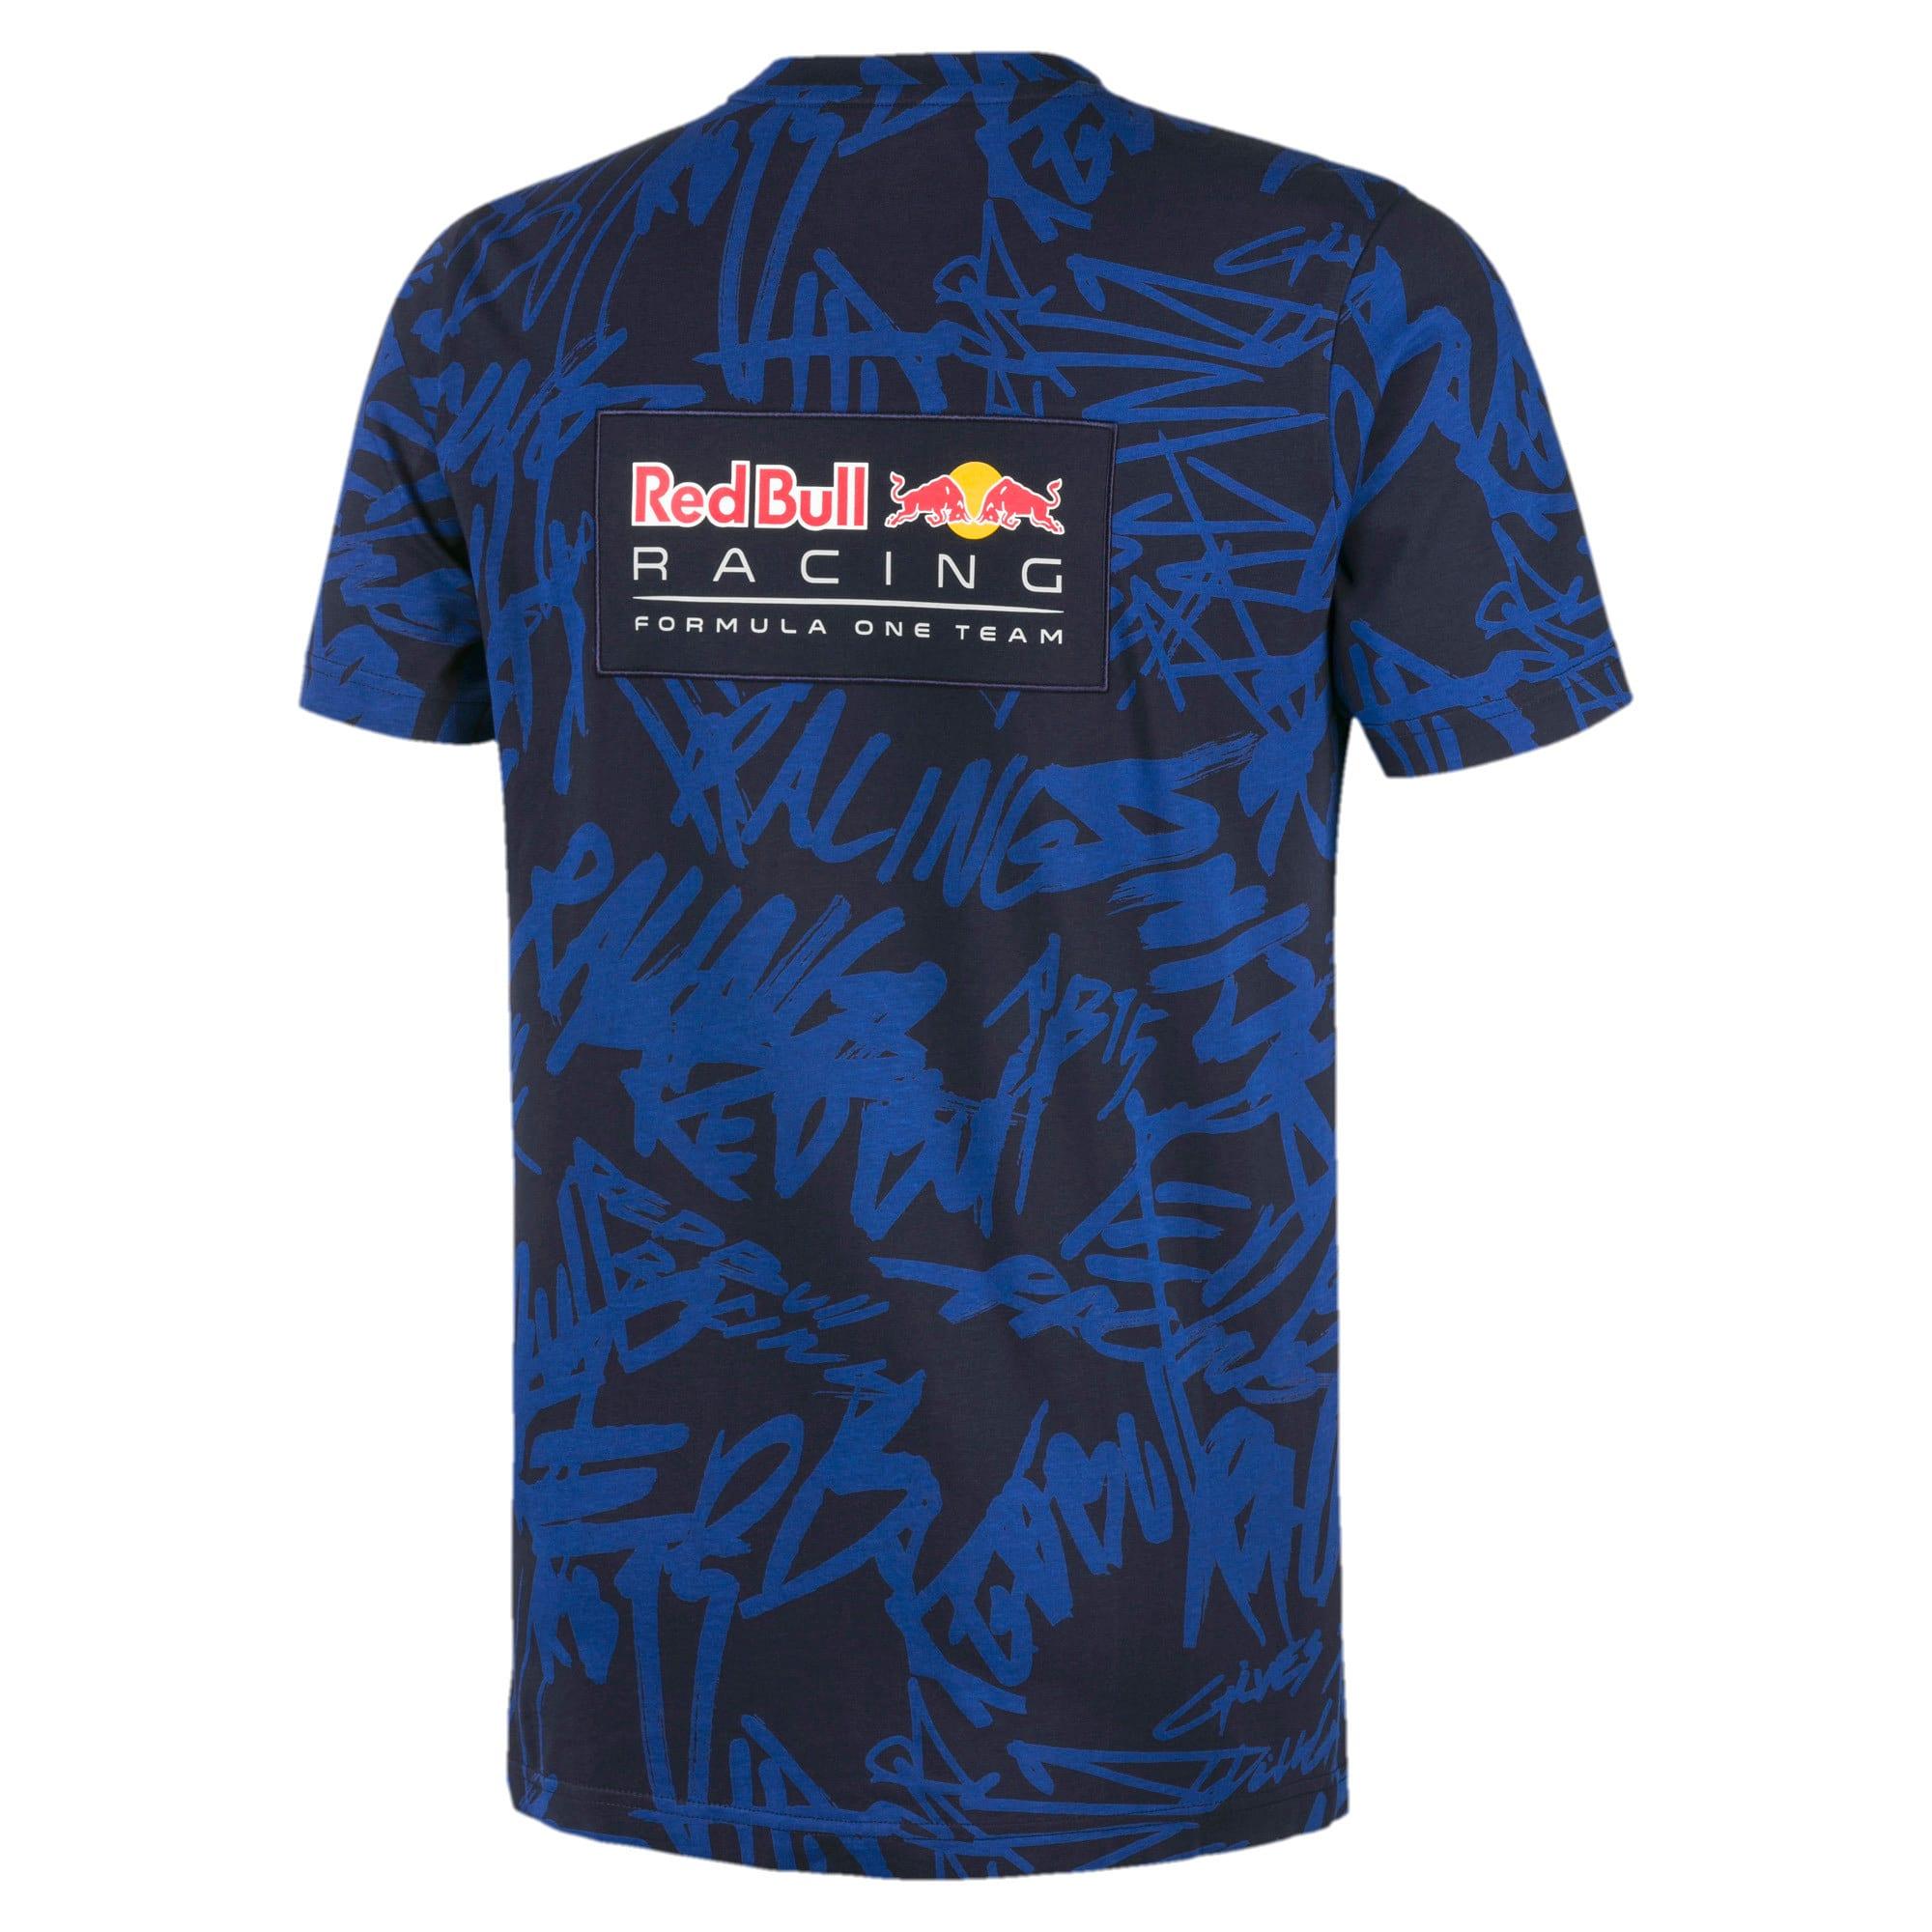 Thumbnail 5 of Red Bull Racing Herren T-Shirt, NIGHT SKY, medium